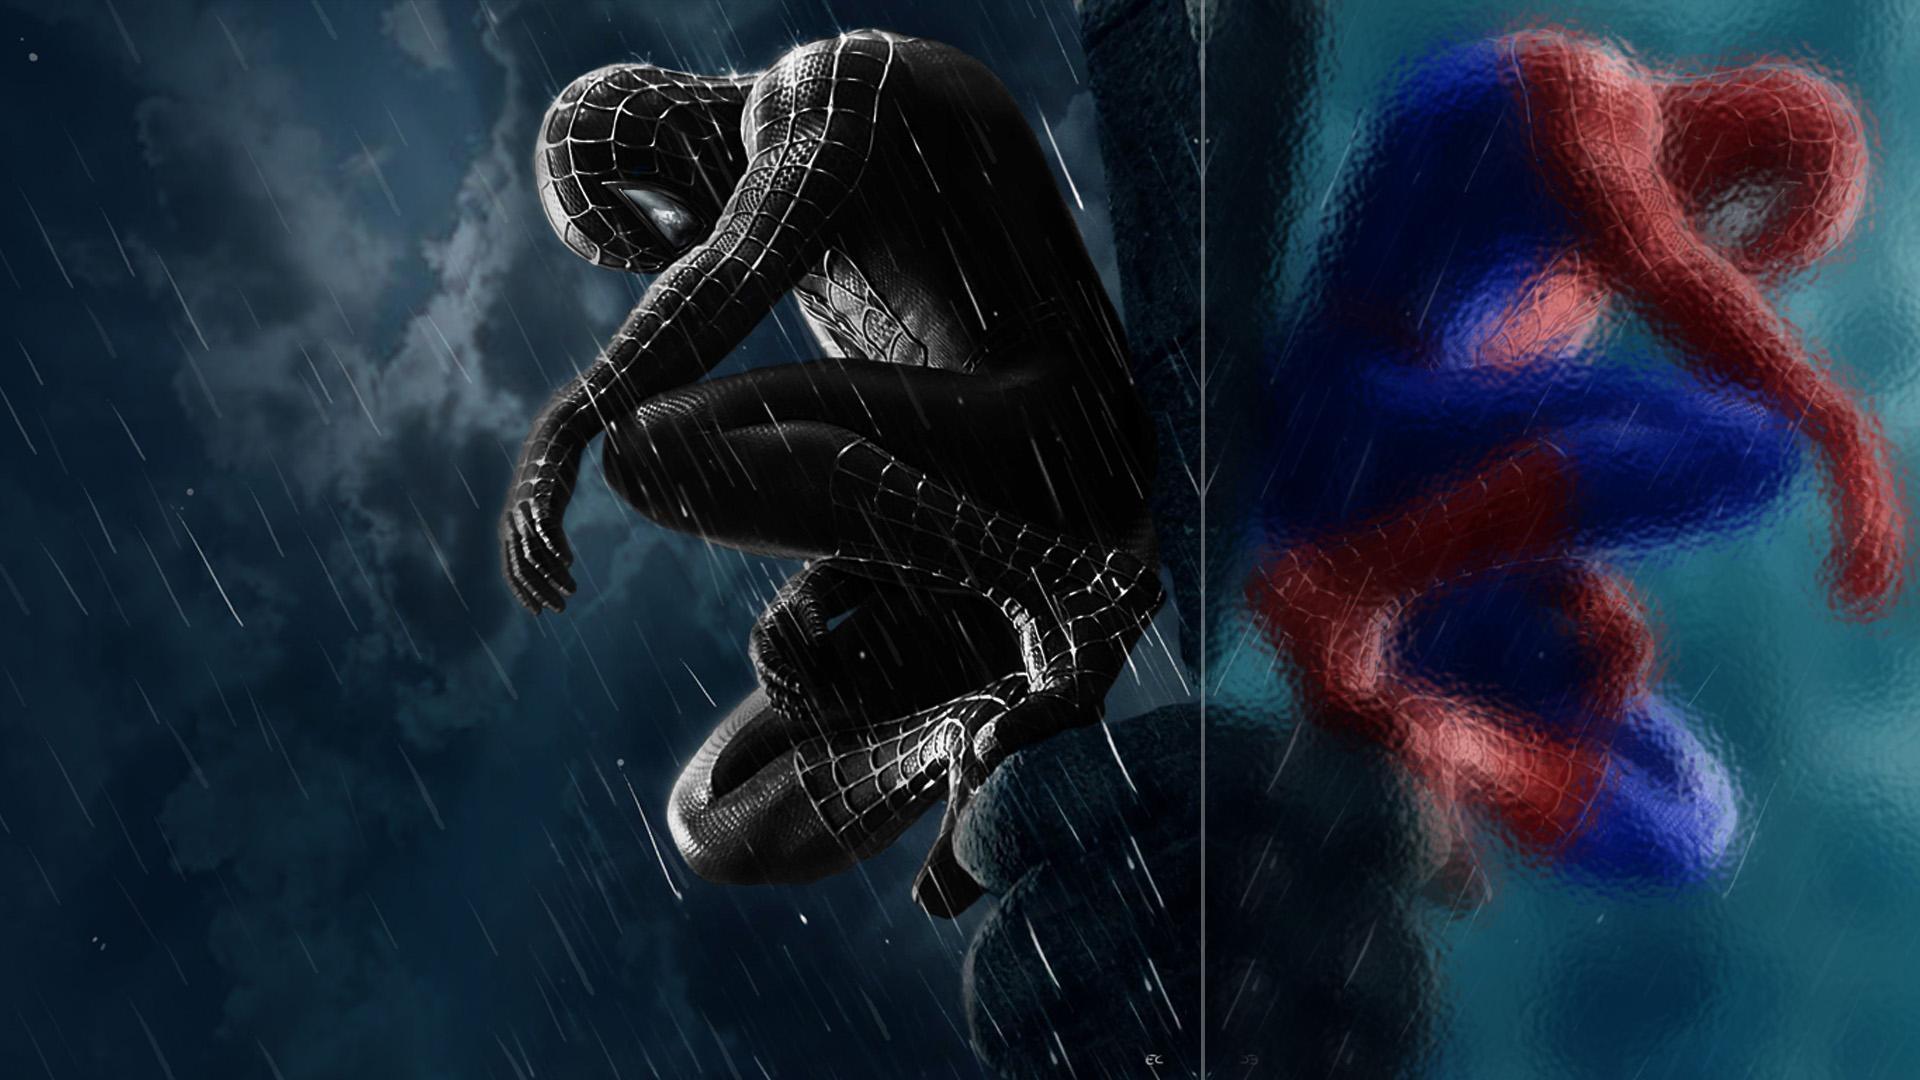 wallpaper.wiki-Black-Spiderman-Iphone-Desktop-Wallpapers-PIC-